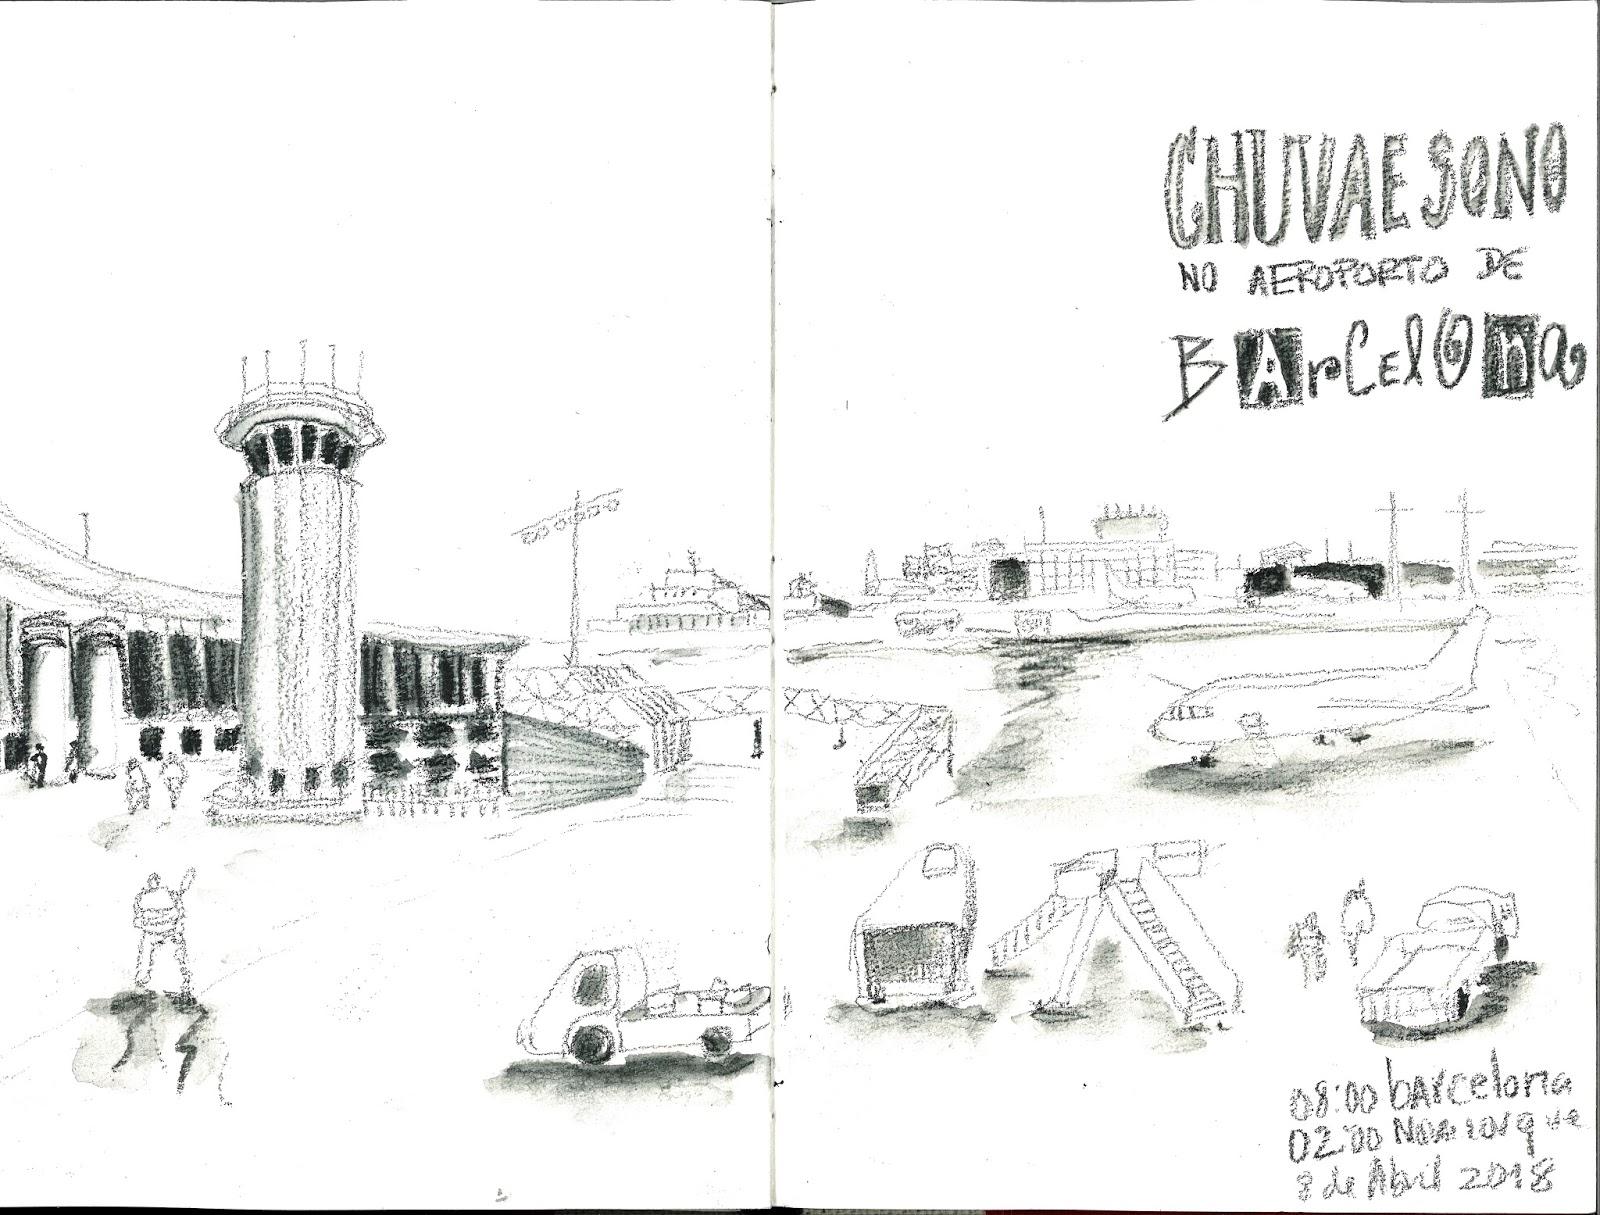 Teresa Ruivo Chuva E Sono No Aeroporto De Barcelona